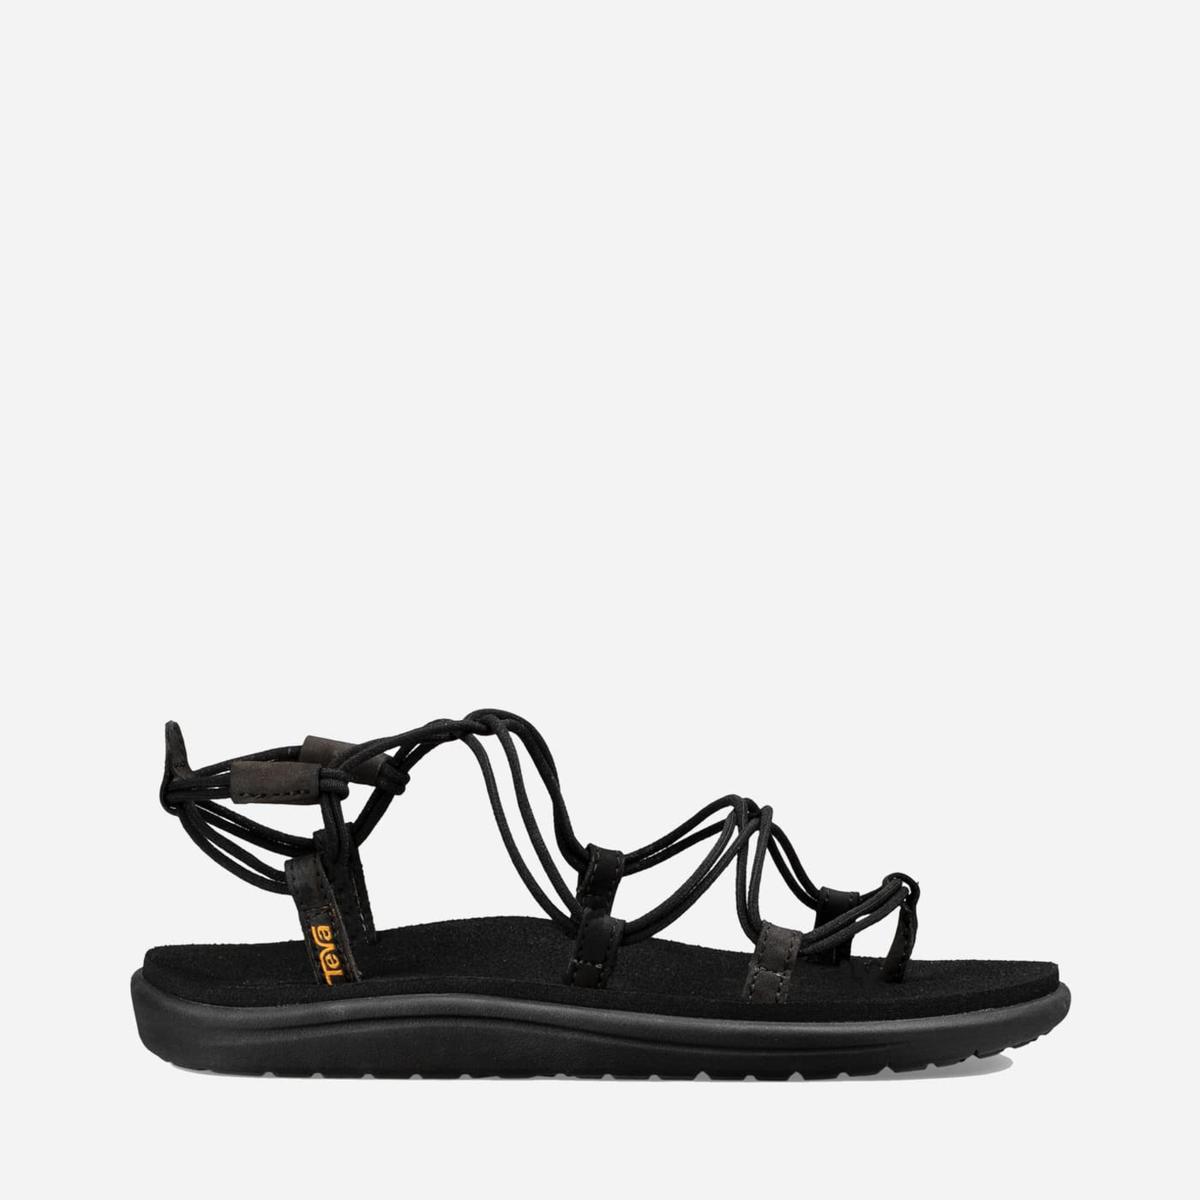 https://jp.teva.com/women-sandals/voya-infinity/1019622B